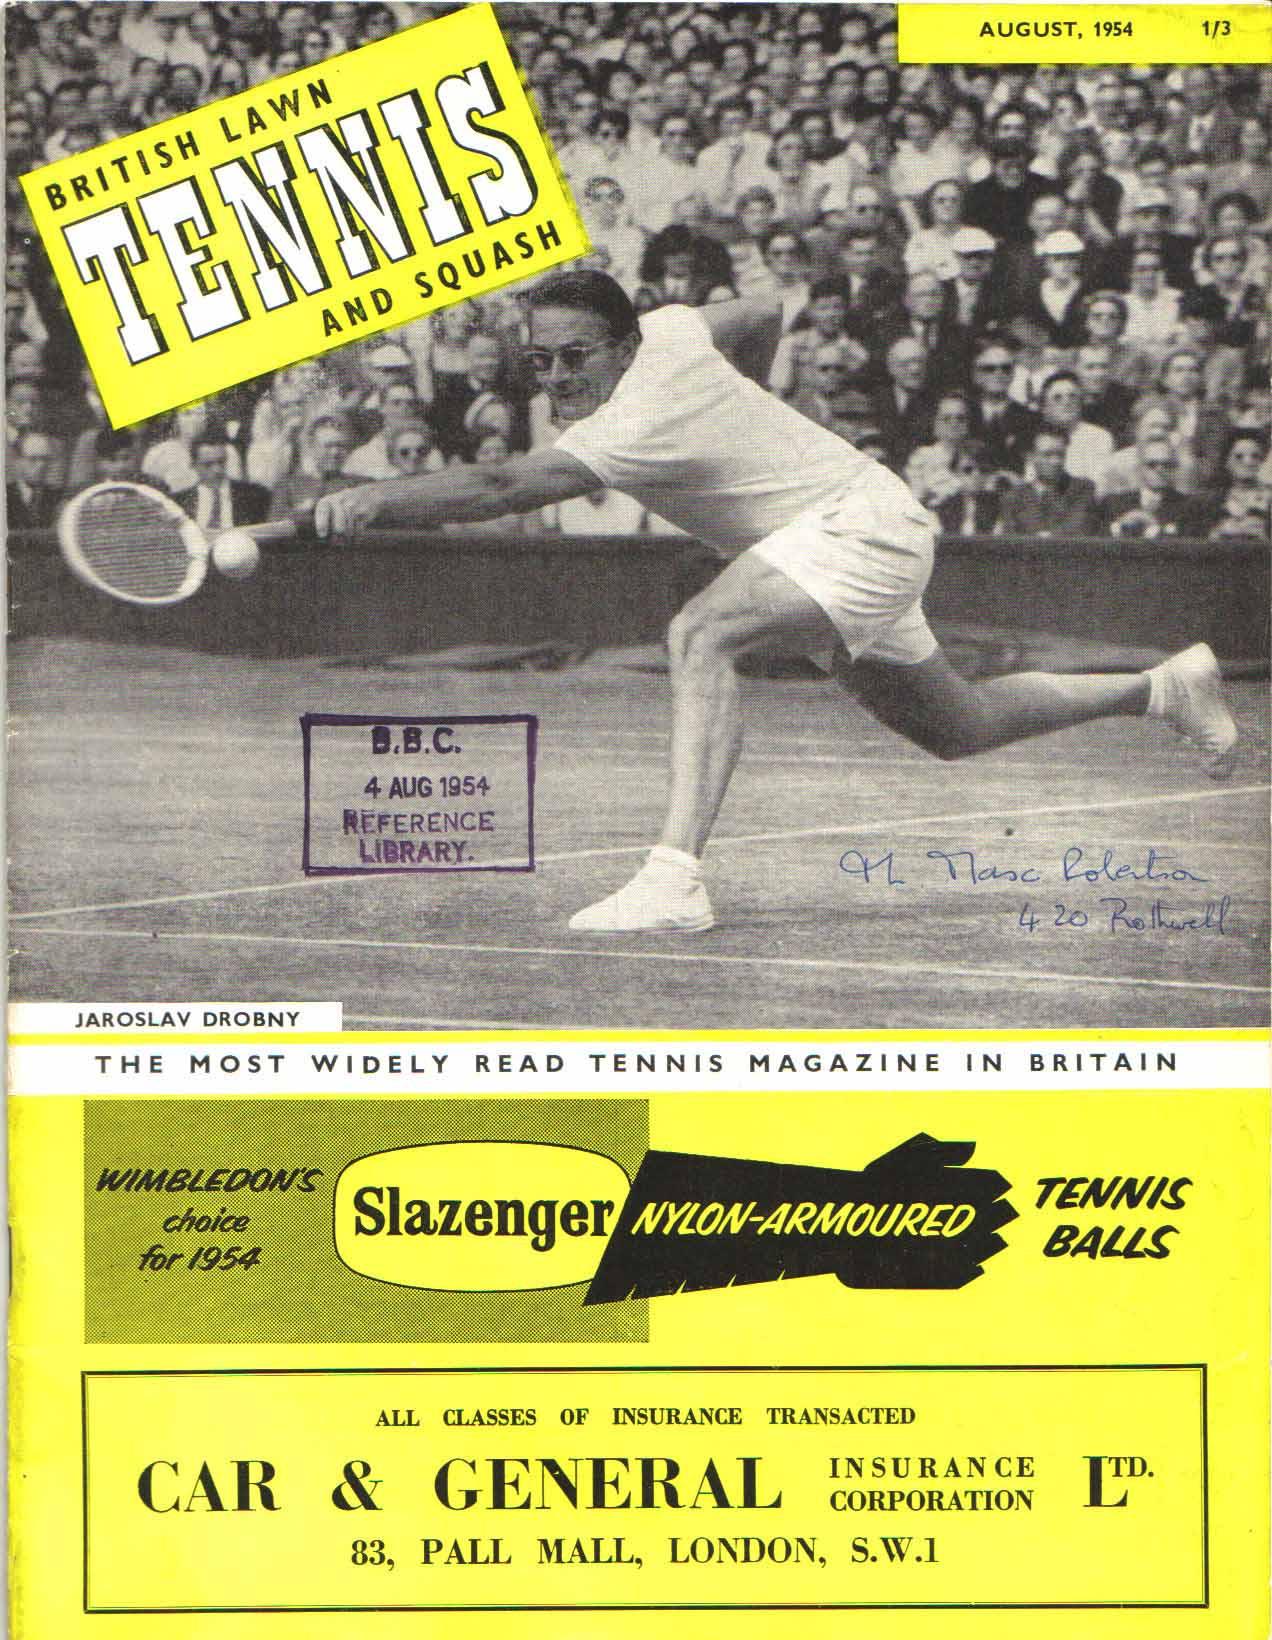 Jim s Tennis Books and Magazines